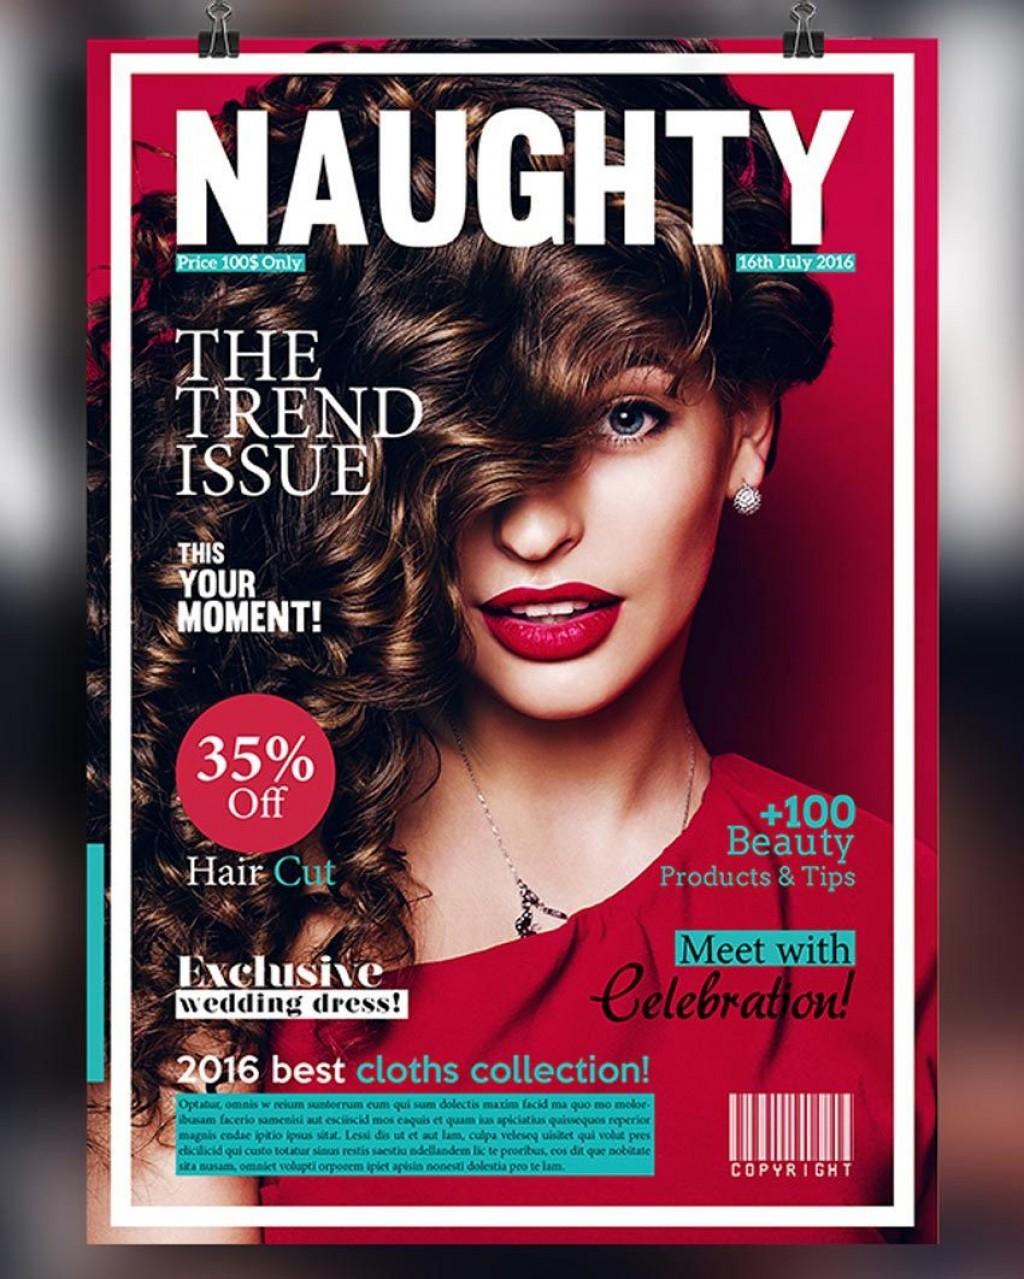 006 Marvelou Photoshop Fashion Magazine Cover Template Free Idea Large